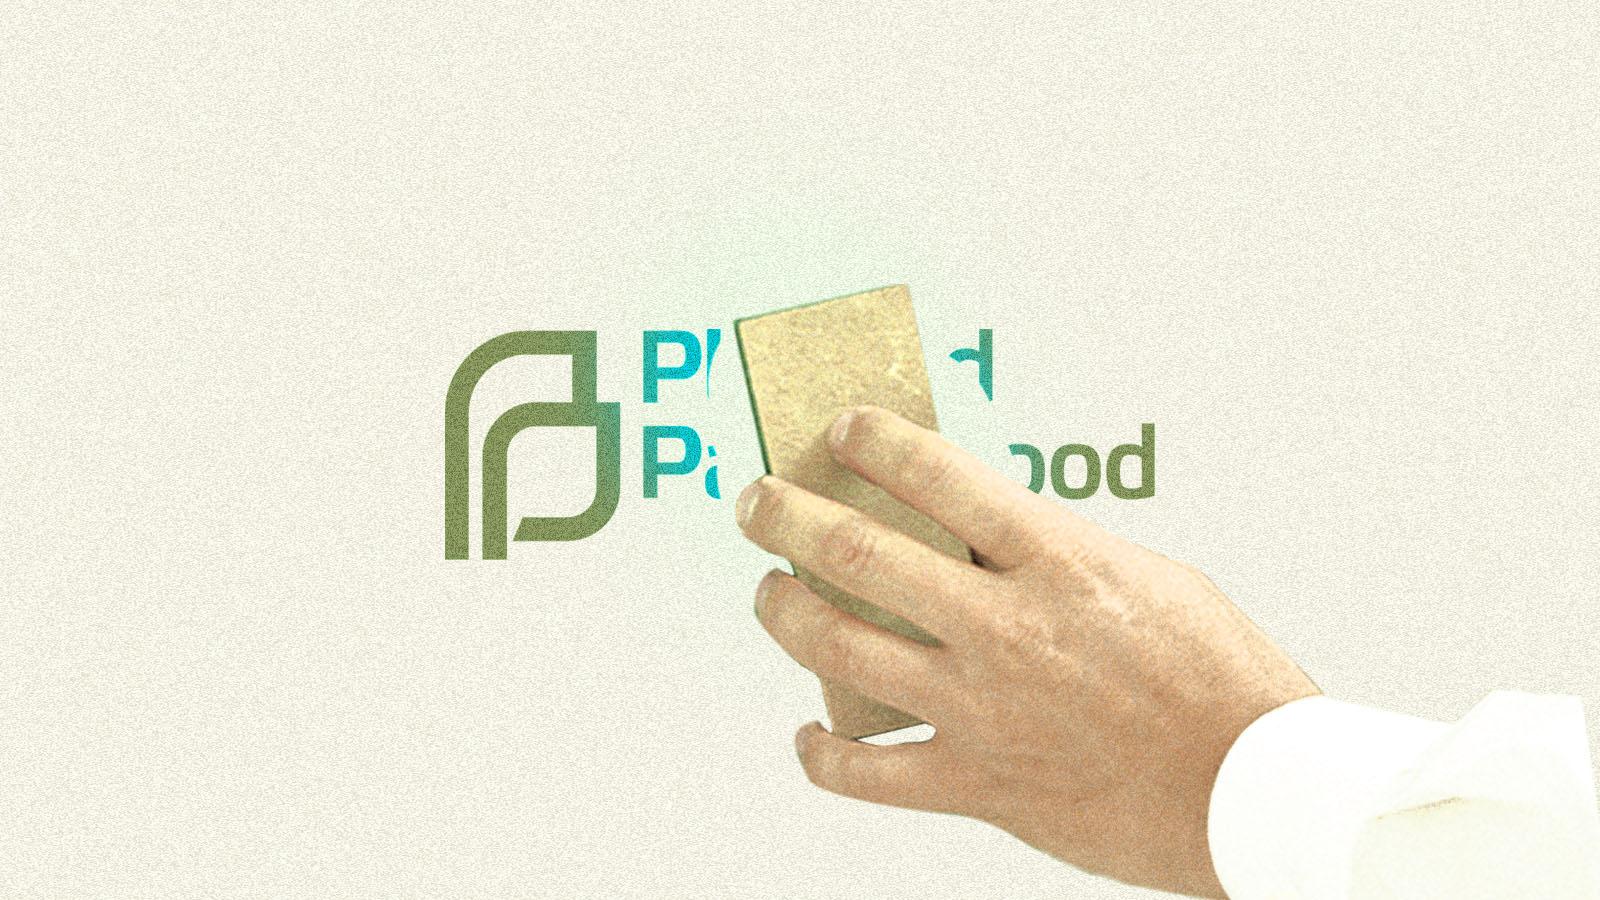 Planned parenthood sperm count